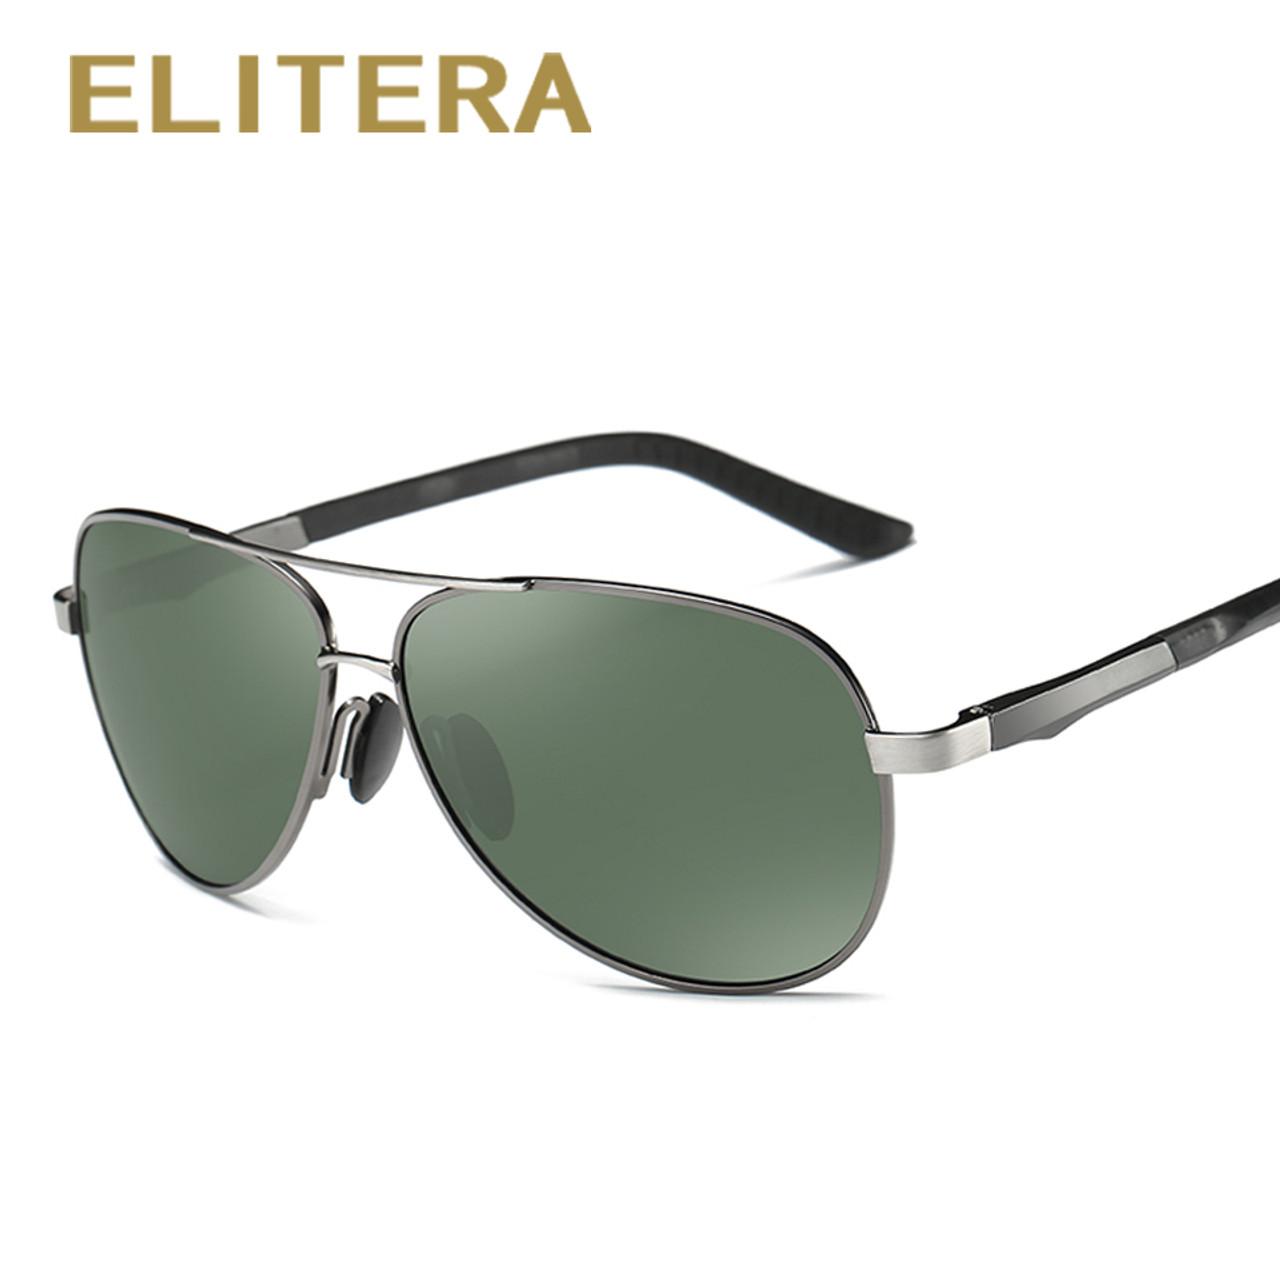 12192126c2 ... ELITERA Aluminum Magnesium Brand Polarized Sunglasses Men New Design  Fishing Driving Sun Glasses Eyewear Oculos Gafas ...